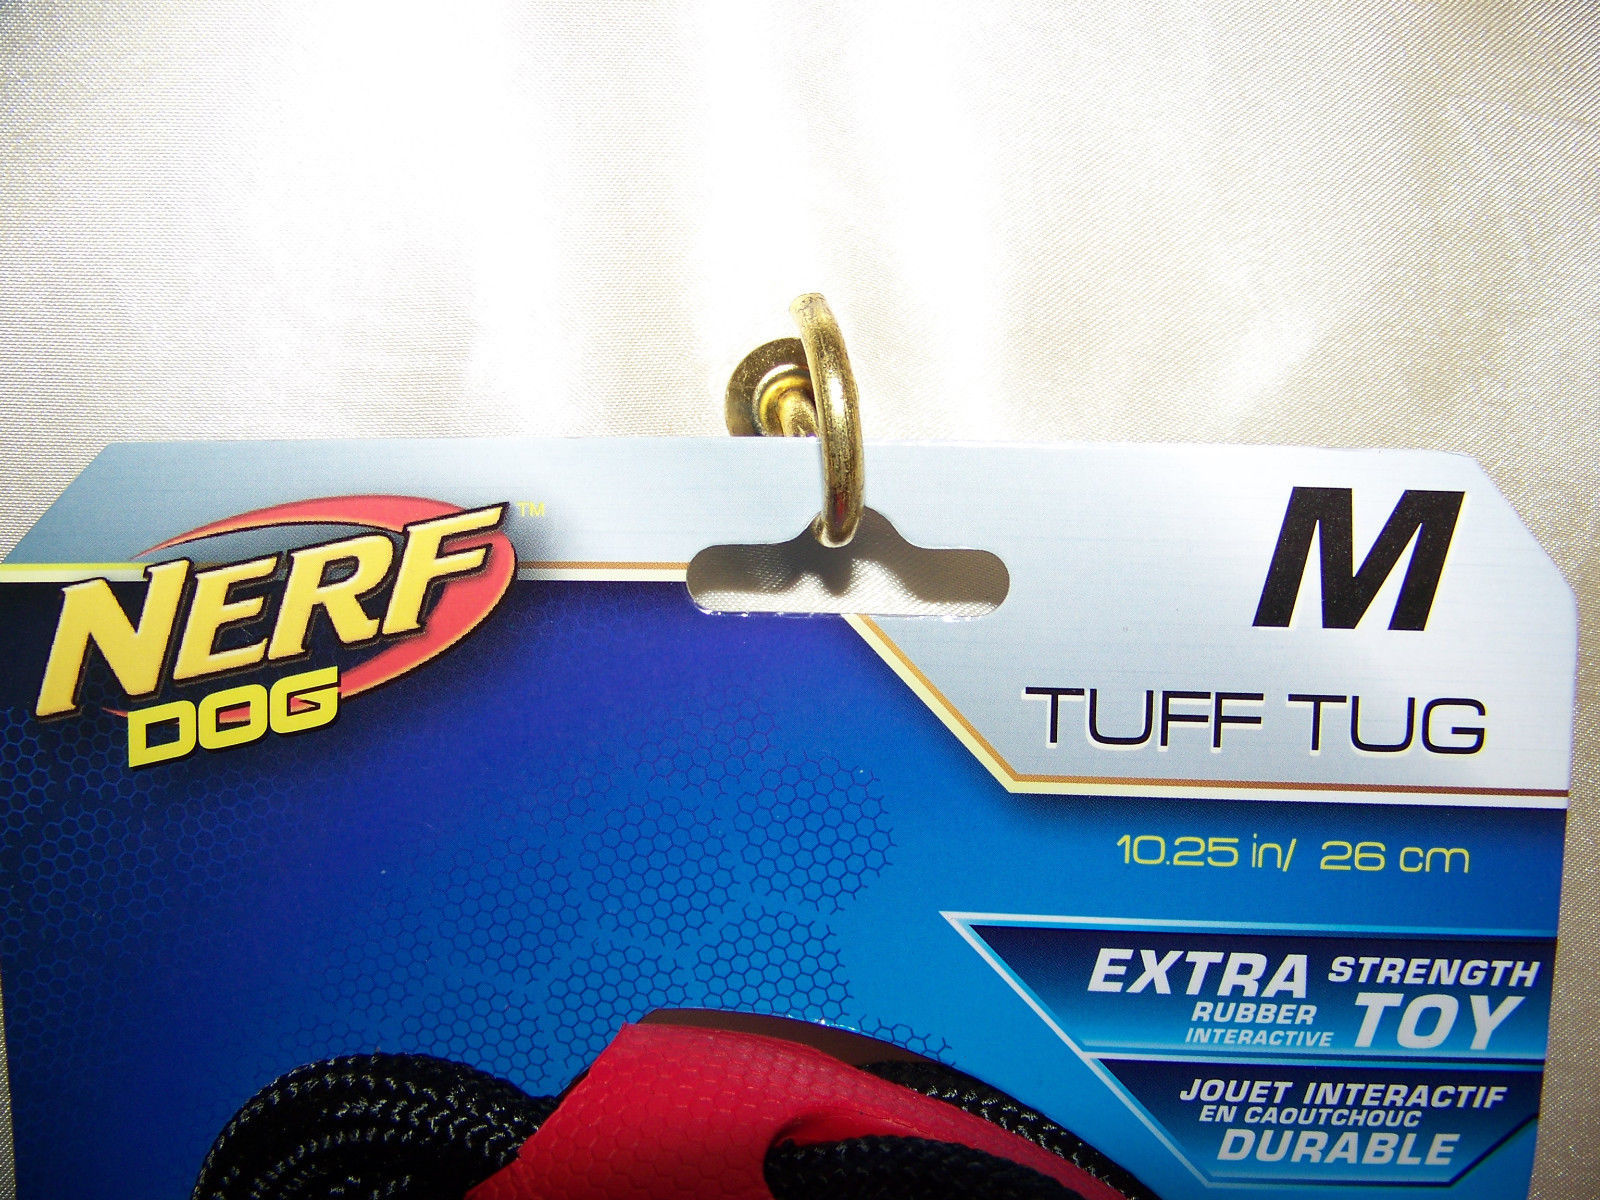 "Nerf Dog Toys Twister Tug, 10.25"", Red/Black"